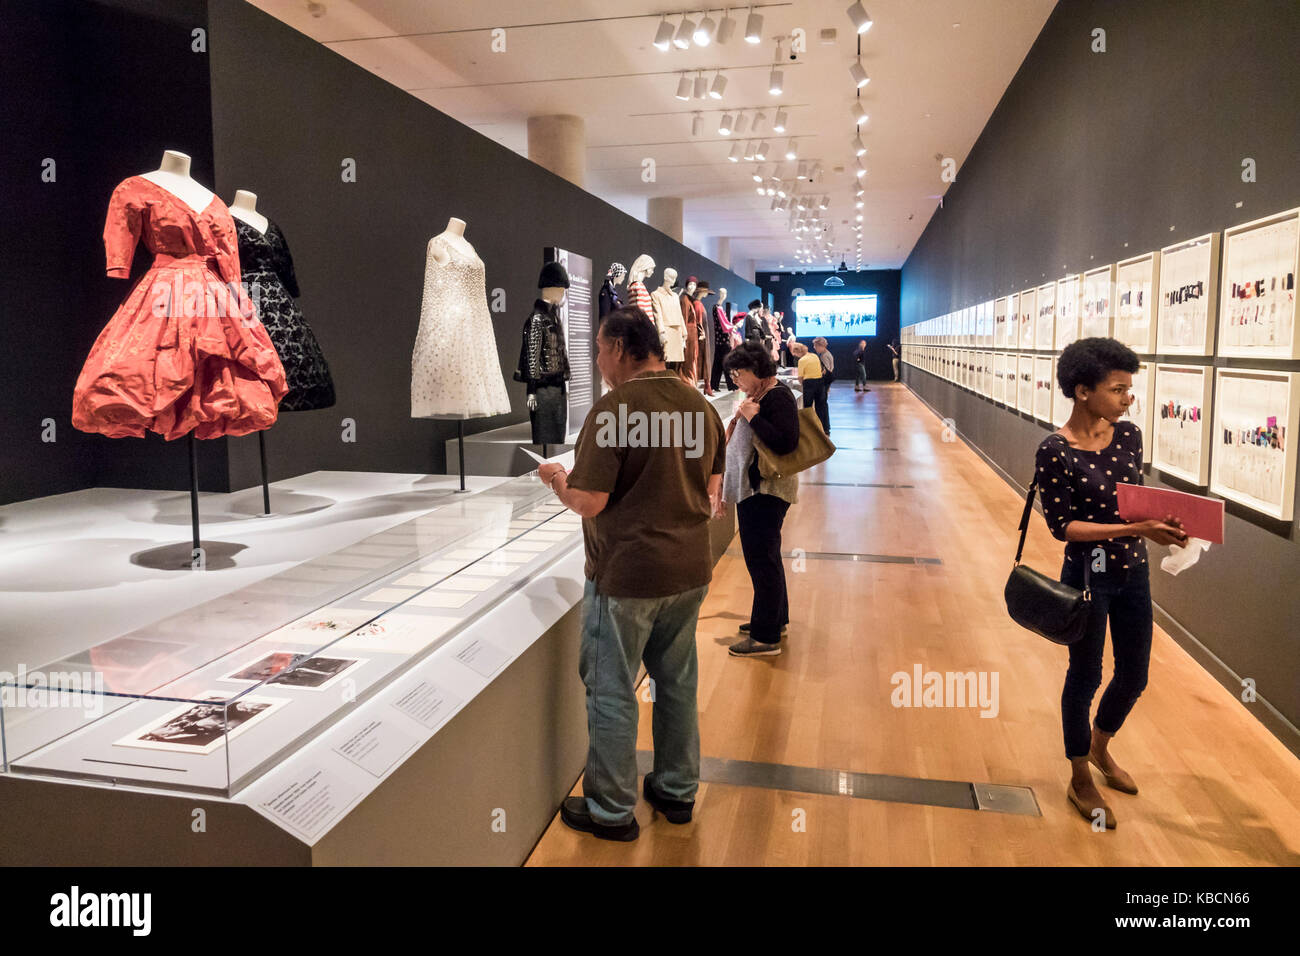 Richmond Virginia Virginia Museum of Fine Arts VMFA special exhibition Yves Saint Laurent fashion French designer - Stock Image